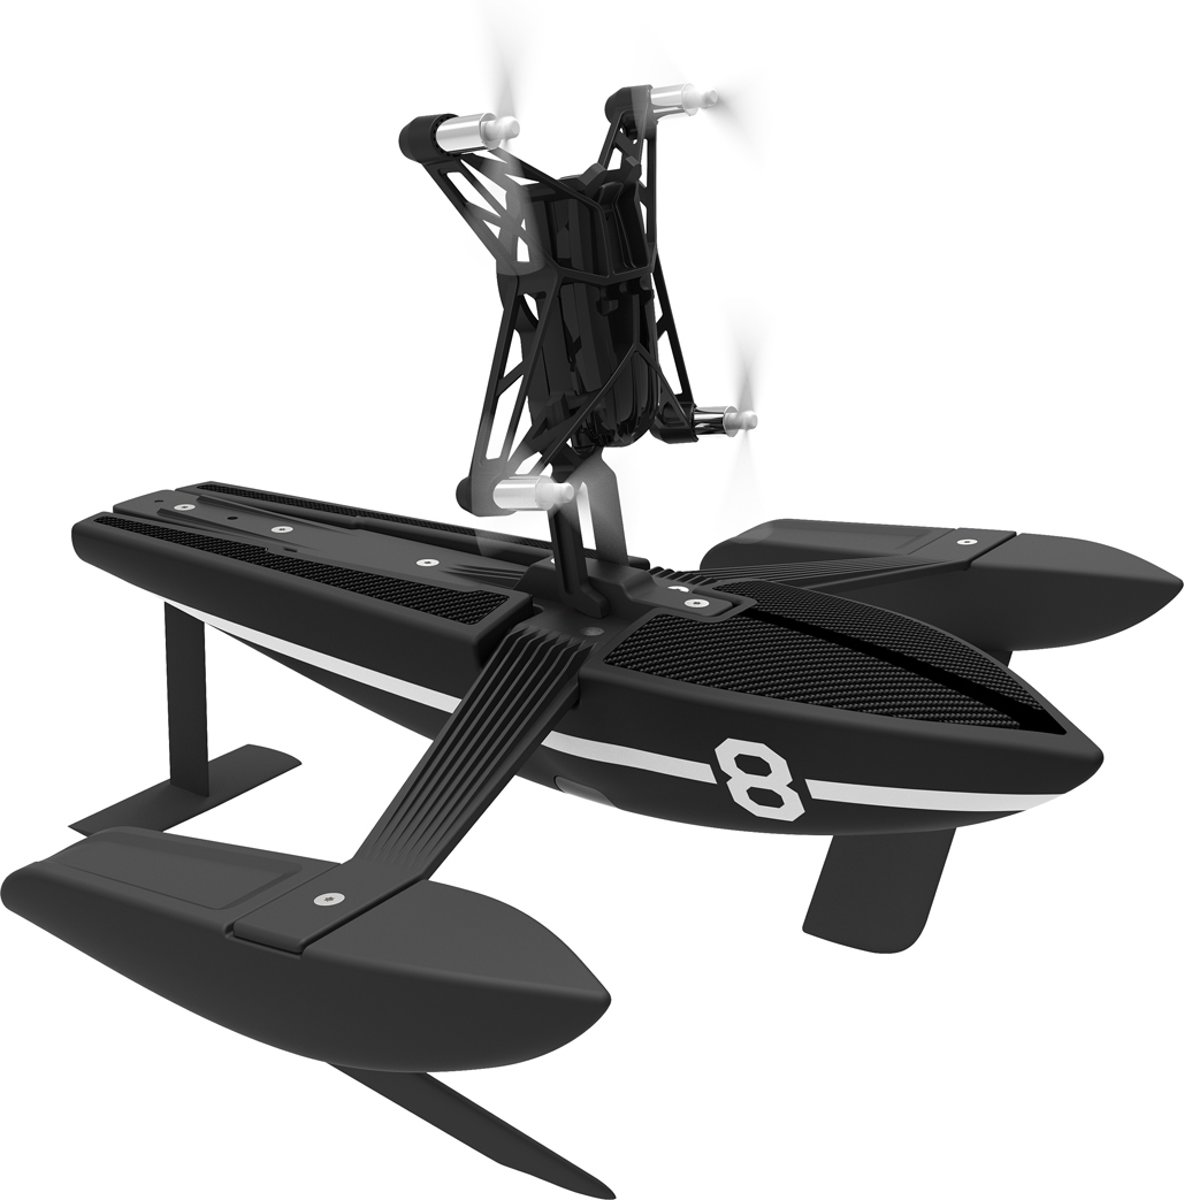 Parrot MiniDrones Hydrofoil - Drone - Orak